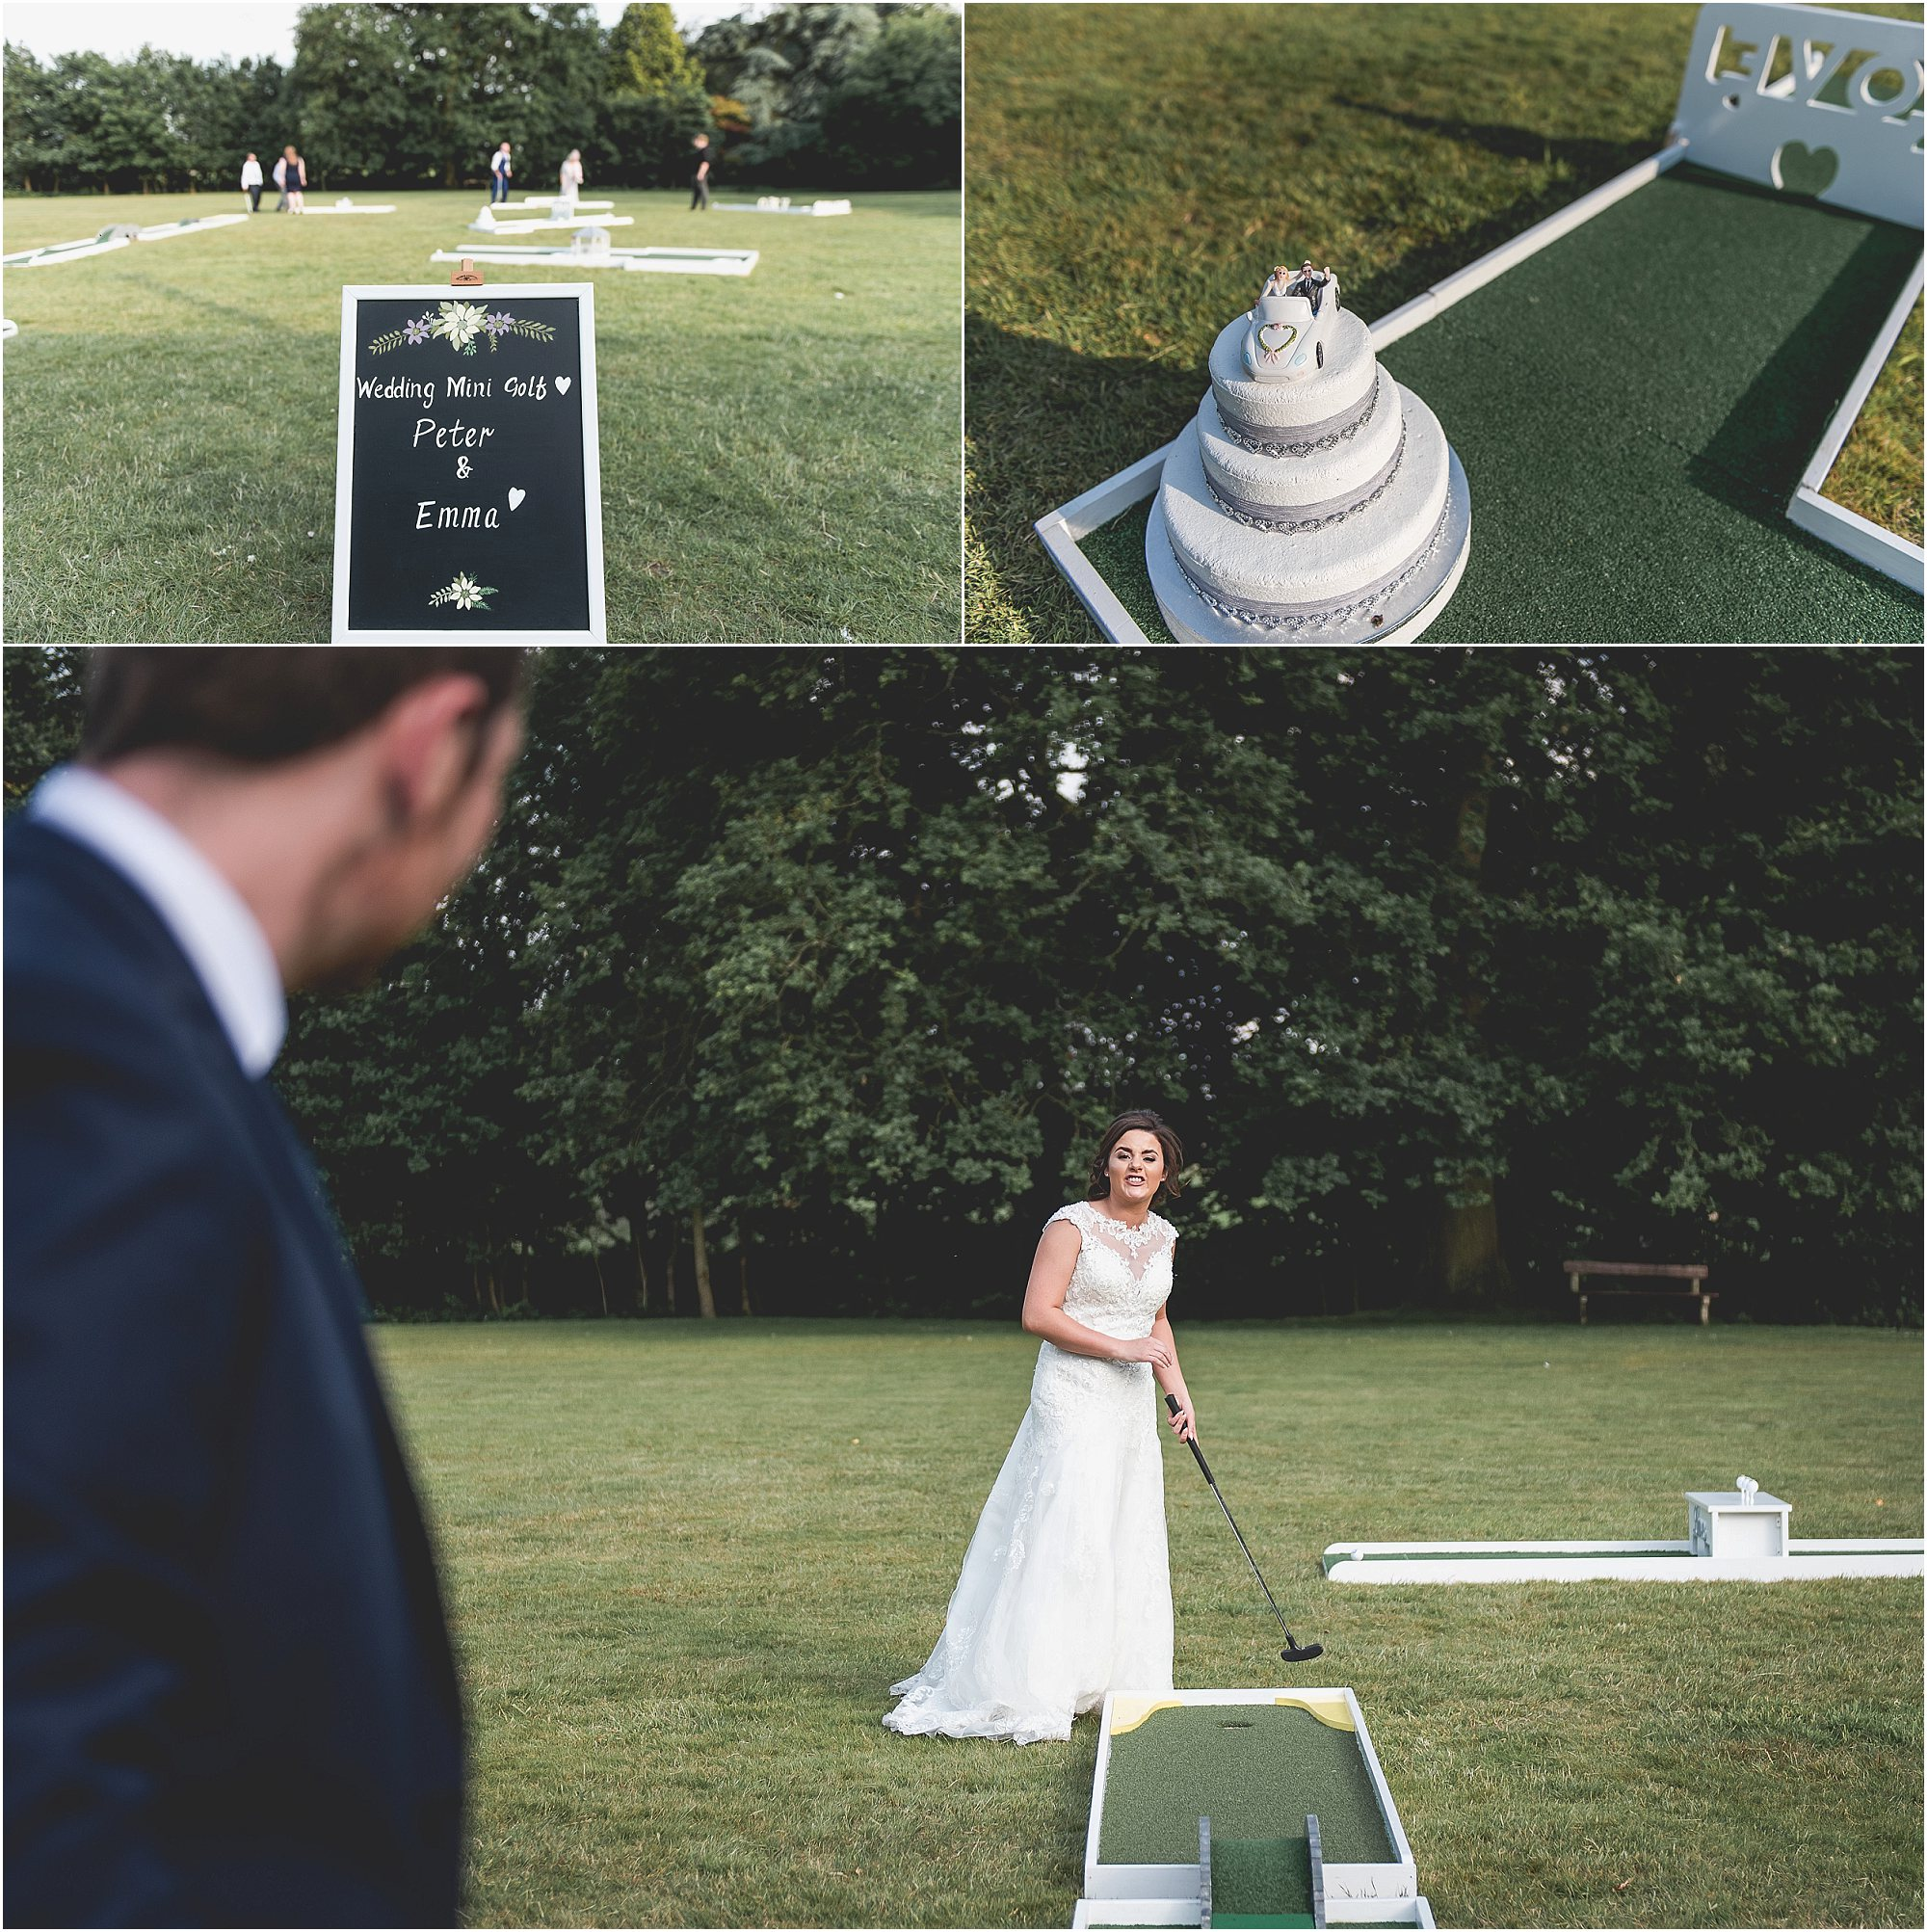 Bride & groom playing mini golf on wedding day